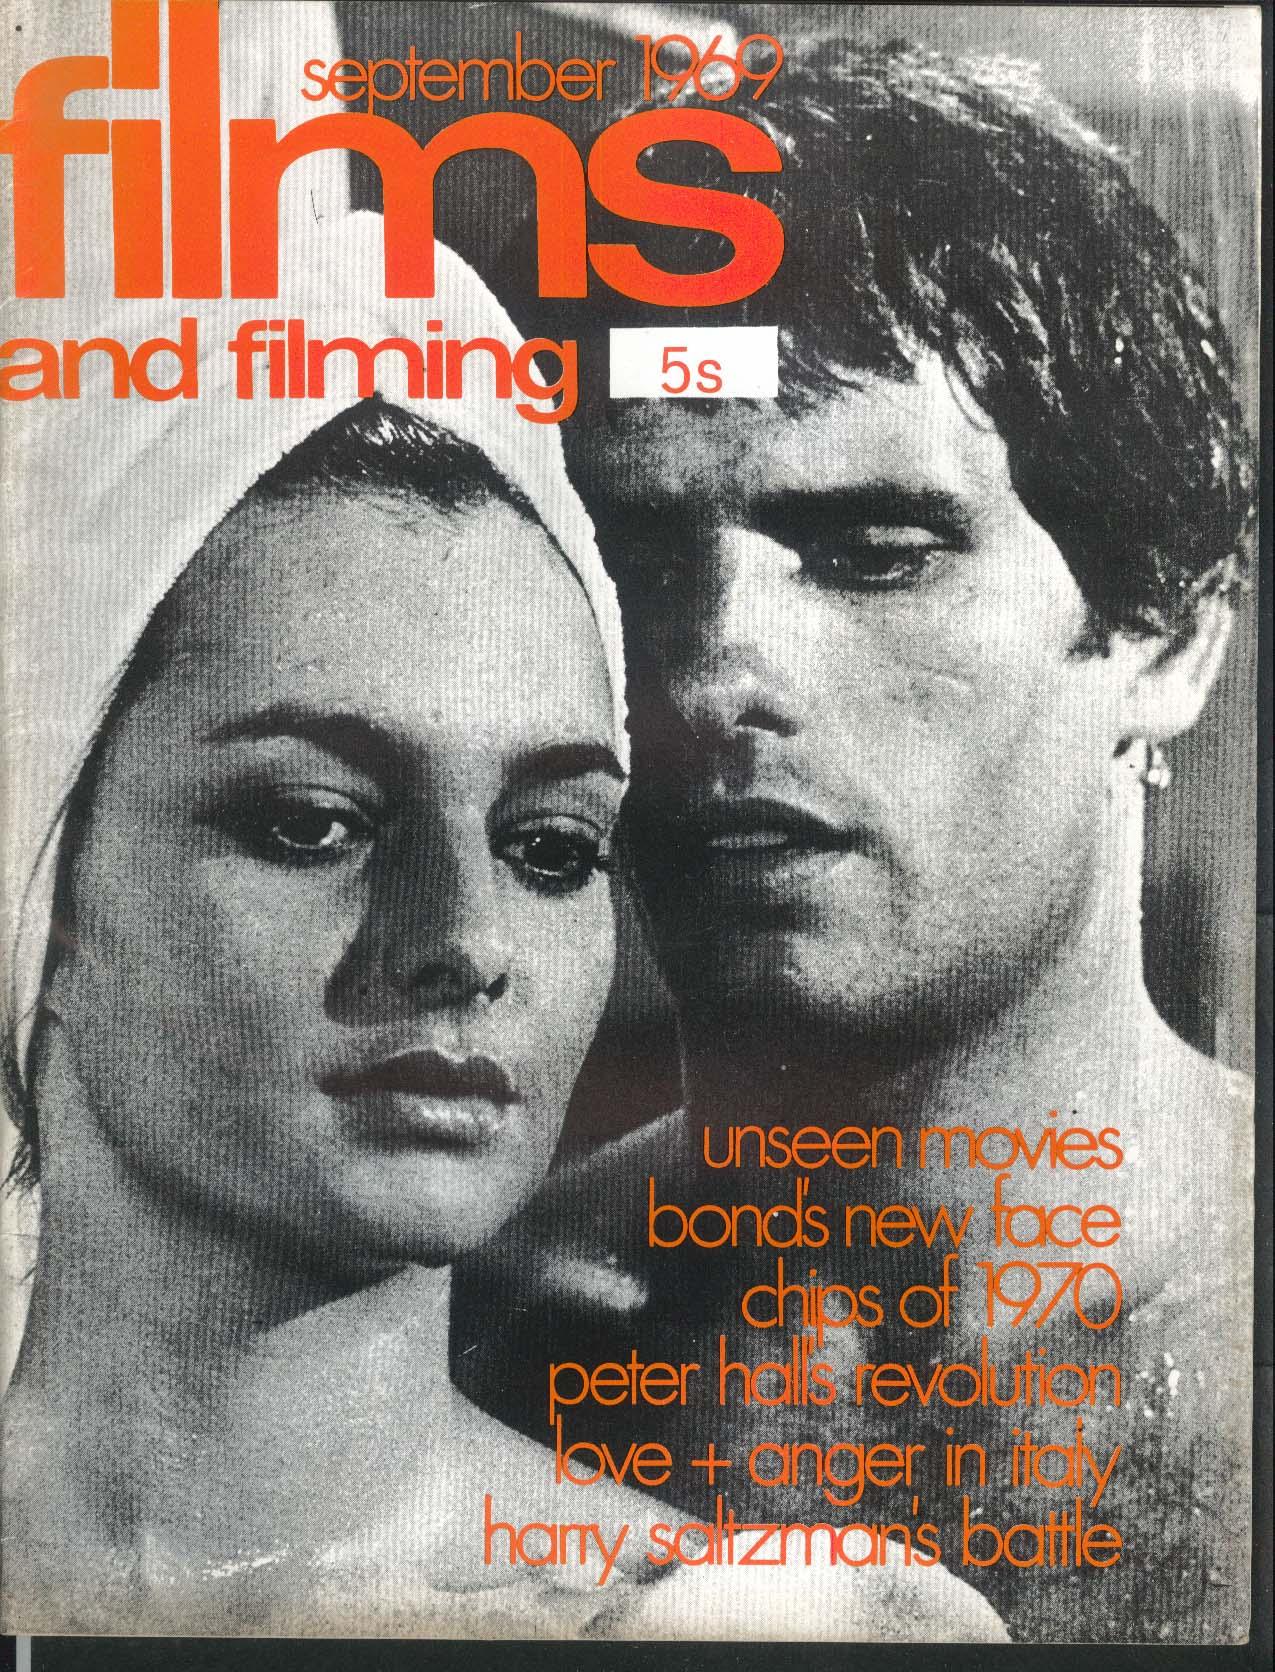 FILMS & FILMING James Bond Peter Hall Harry Saltzman 9 1969